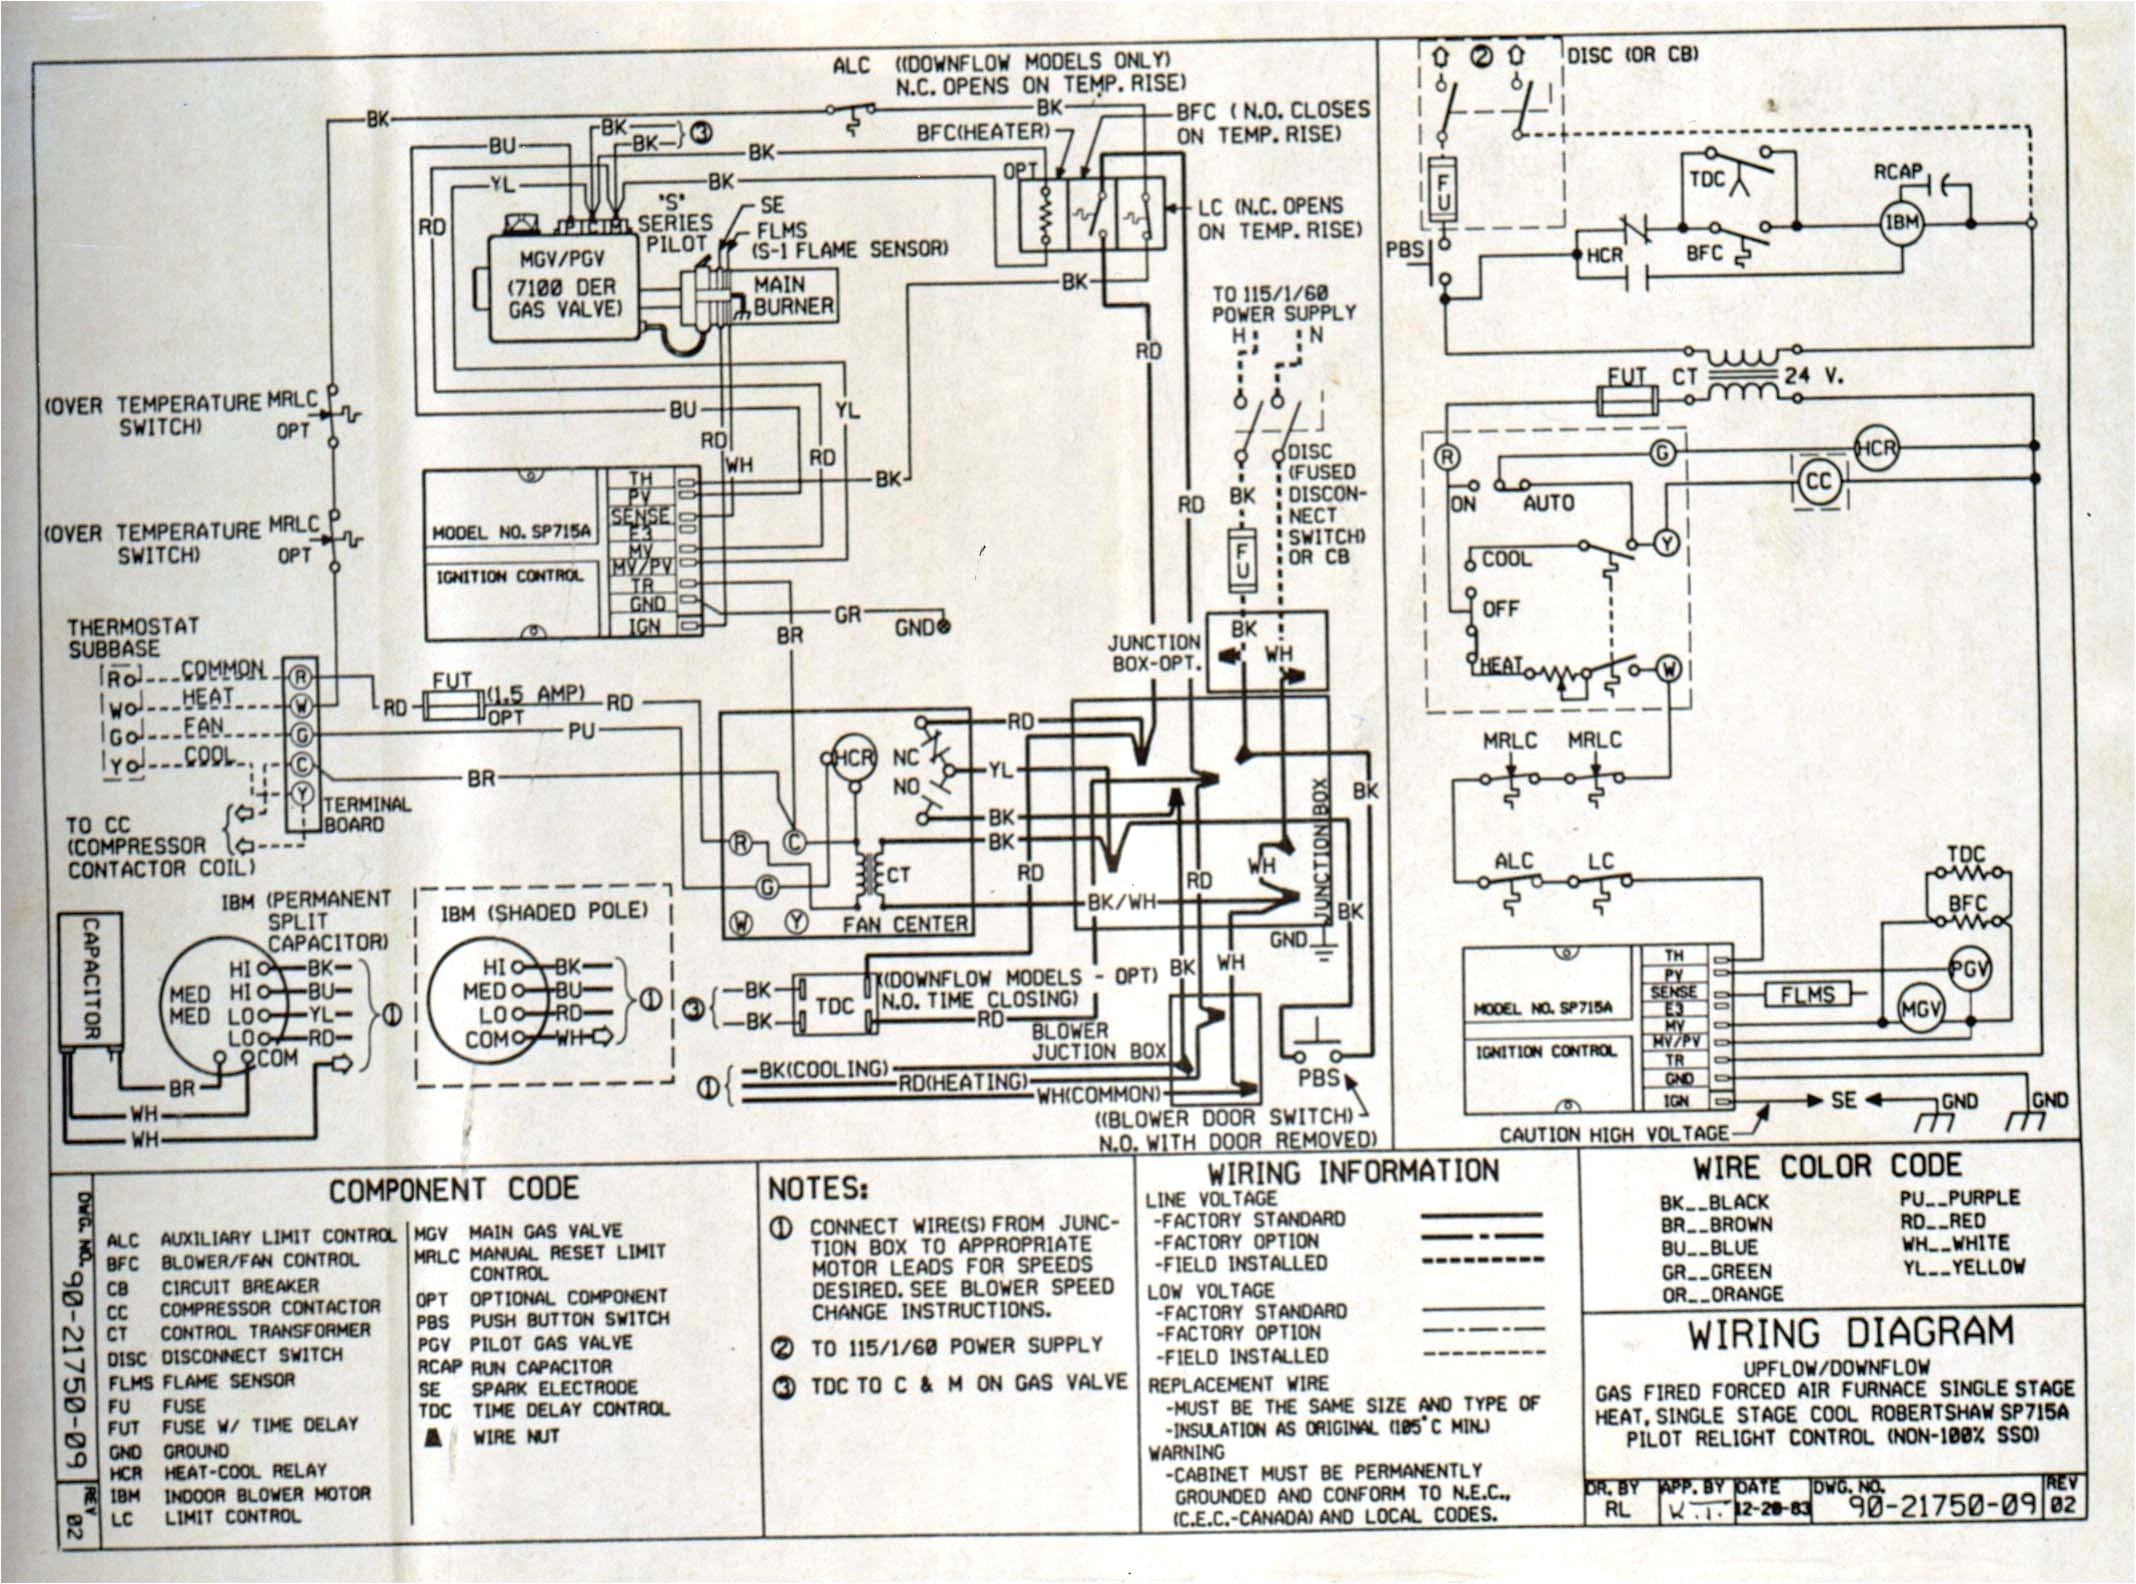 lennox wiring diagram pdf wiring diagram schematic lennox wiring diagram pdf wiring diagram view lennox wiring